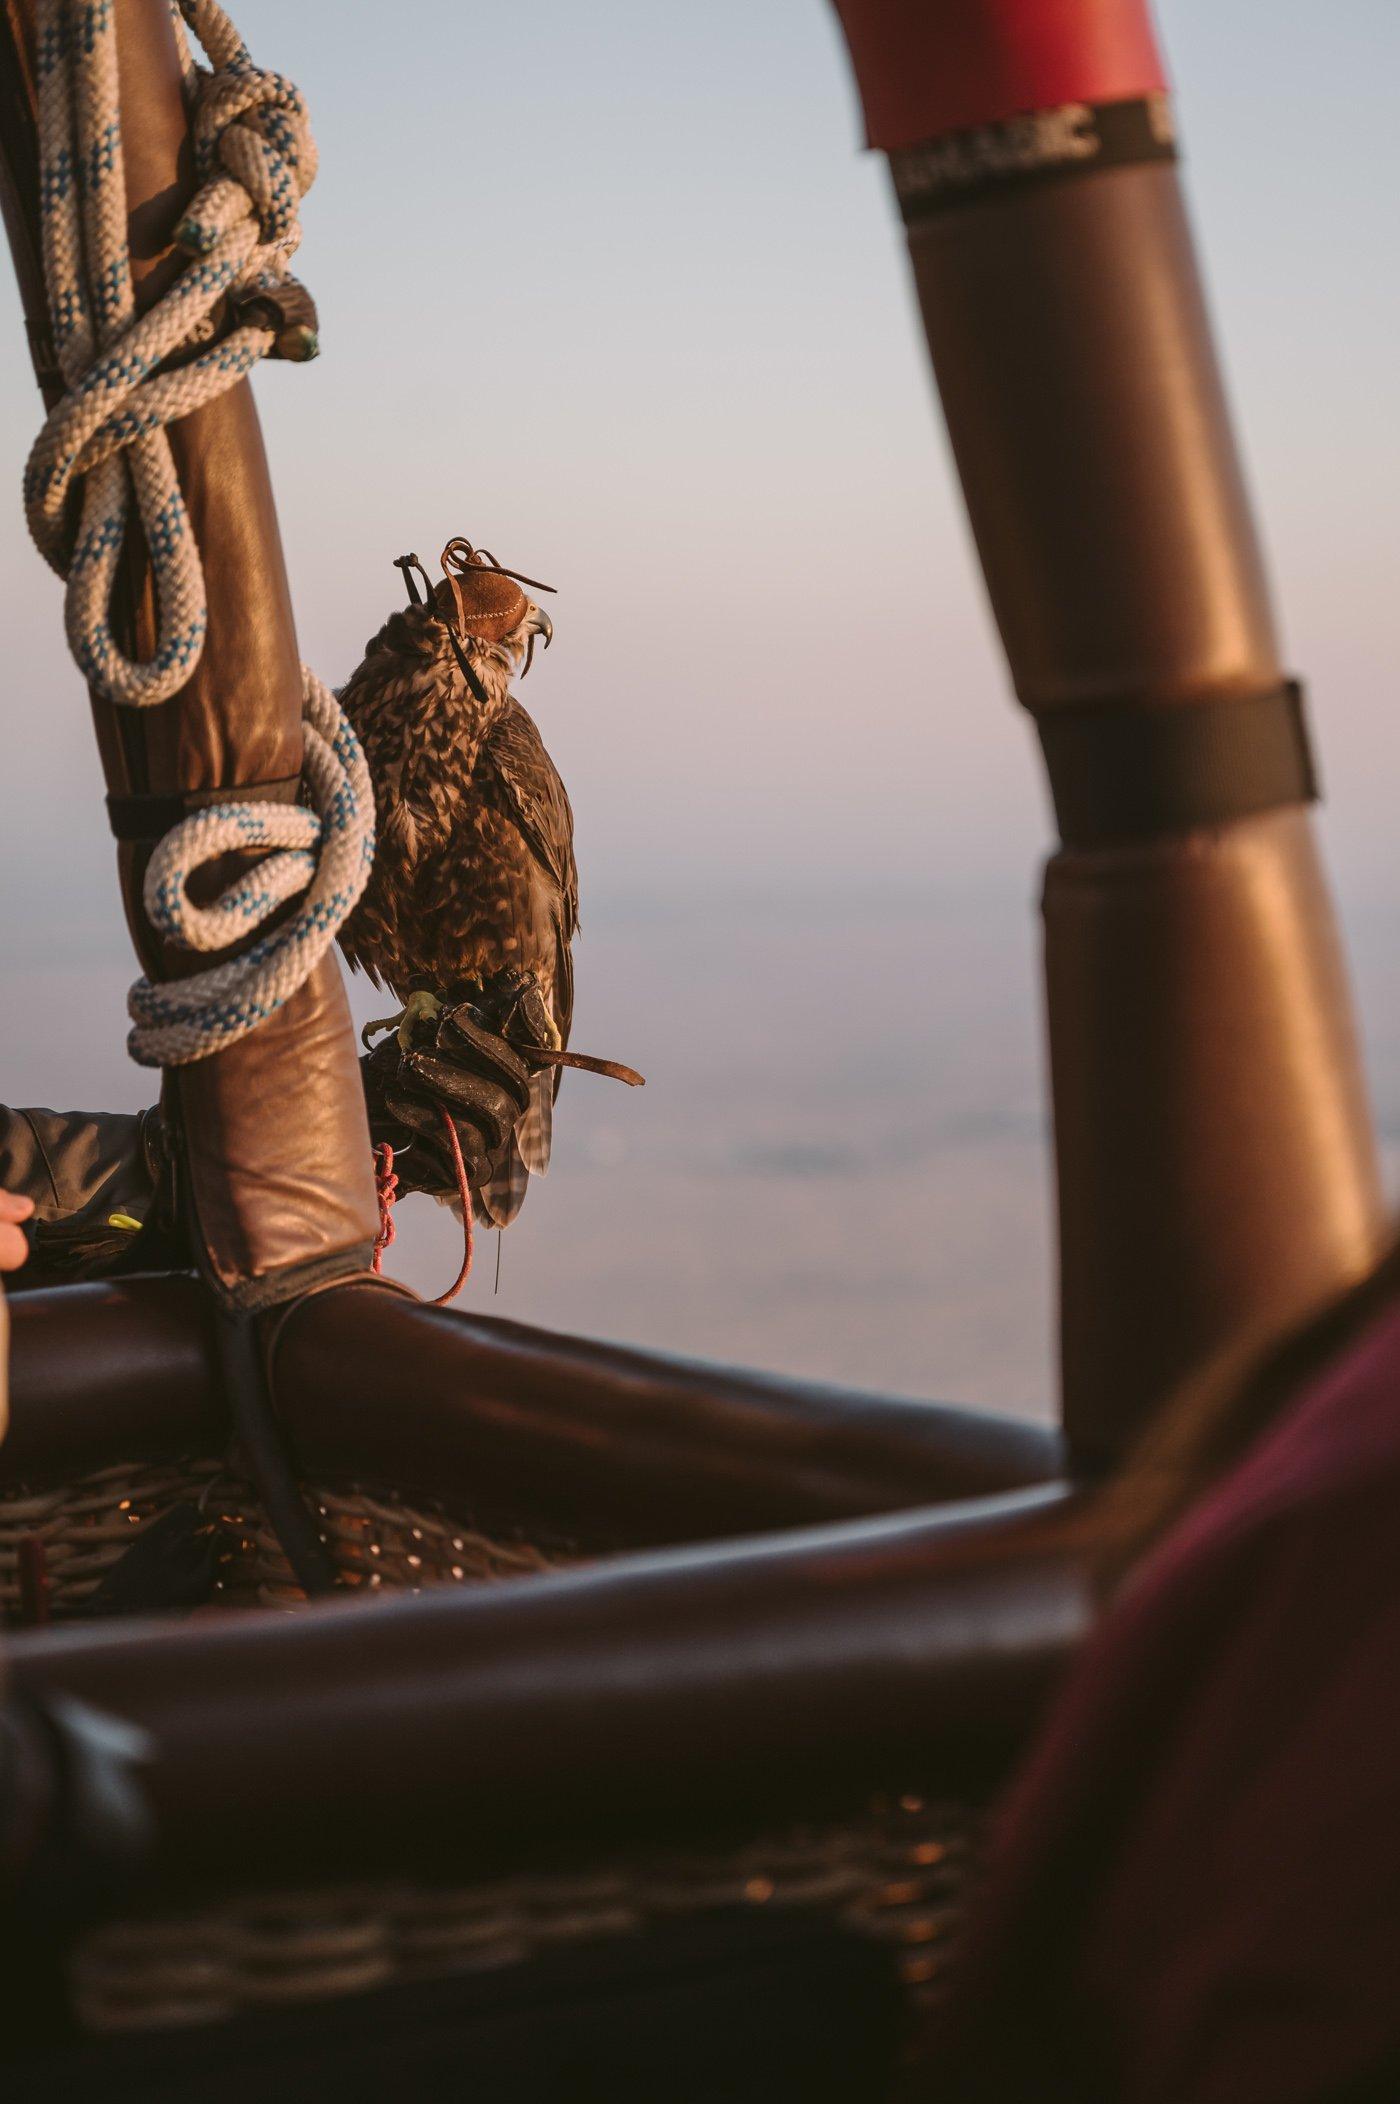 Falcon in the hot air balloon in Dubai